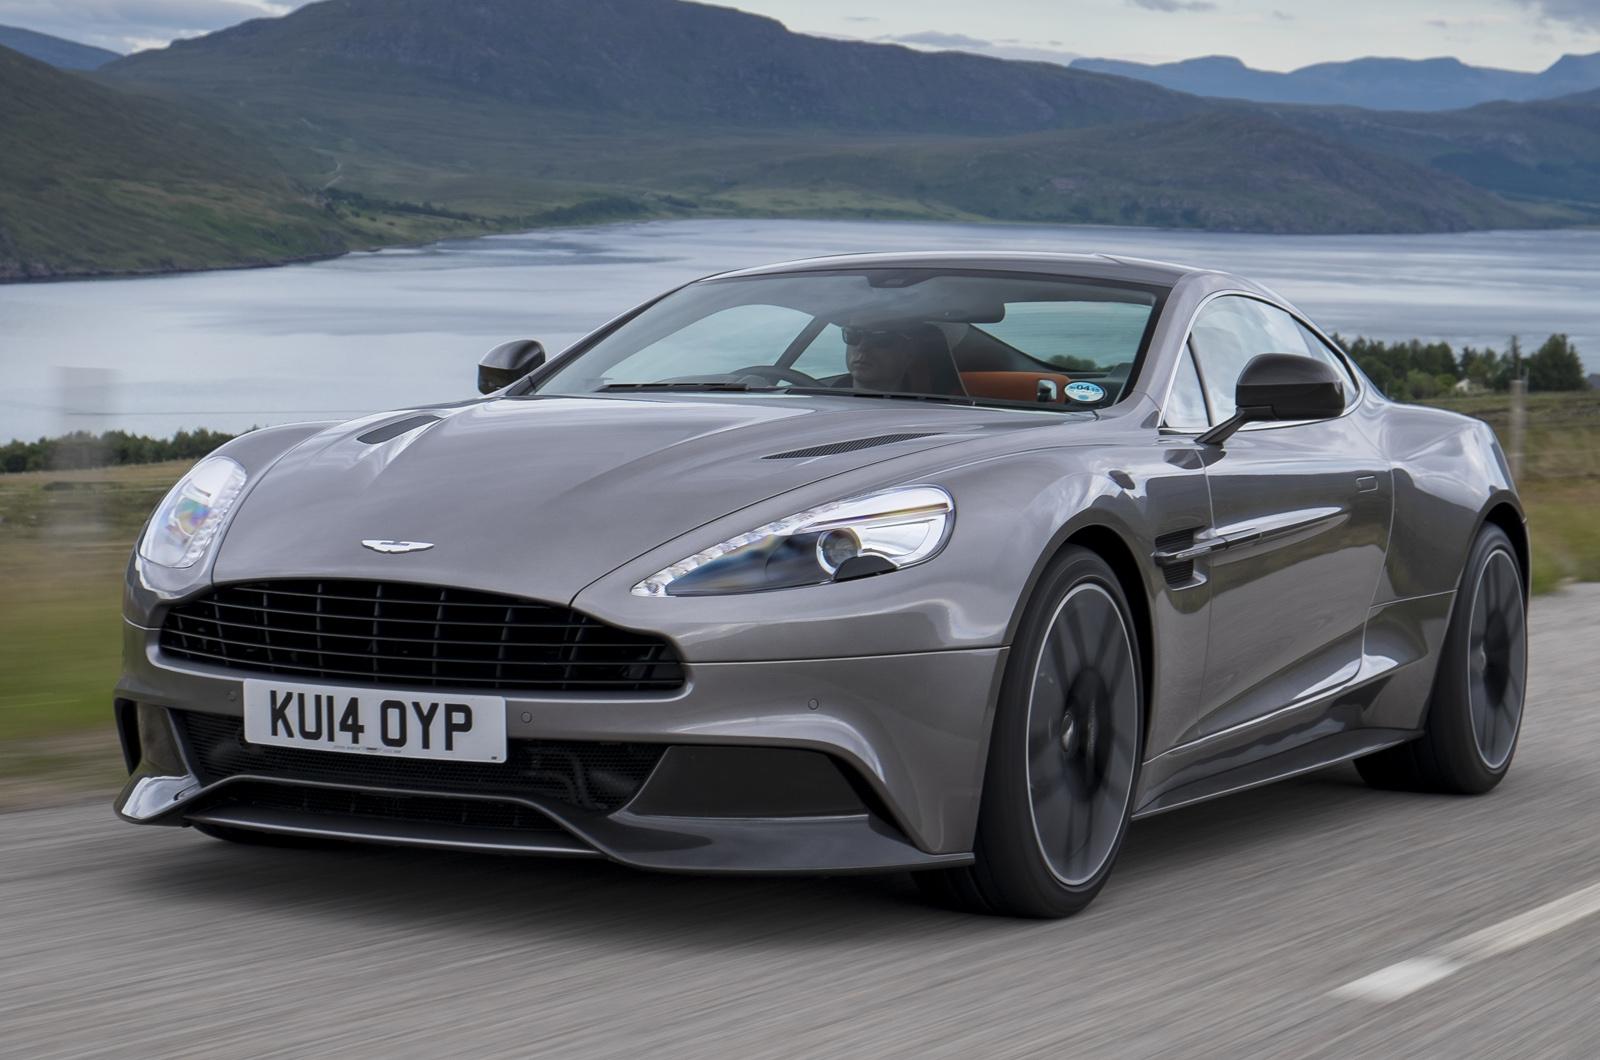 2014 Aston Martin Vanquish First Drive